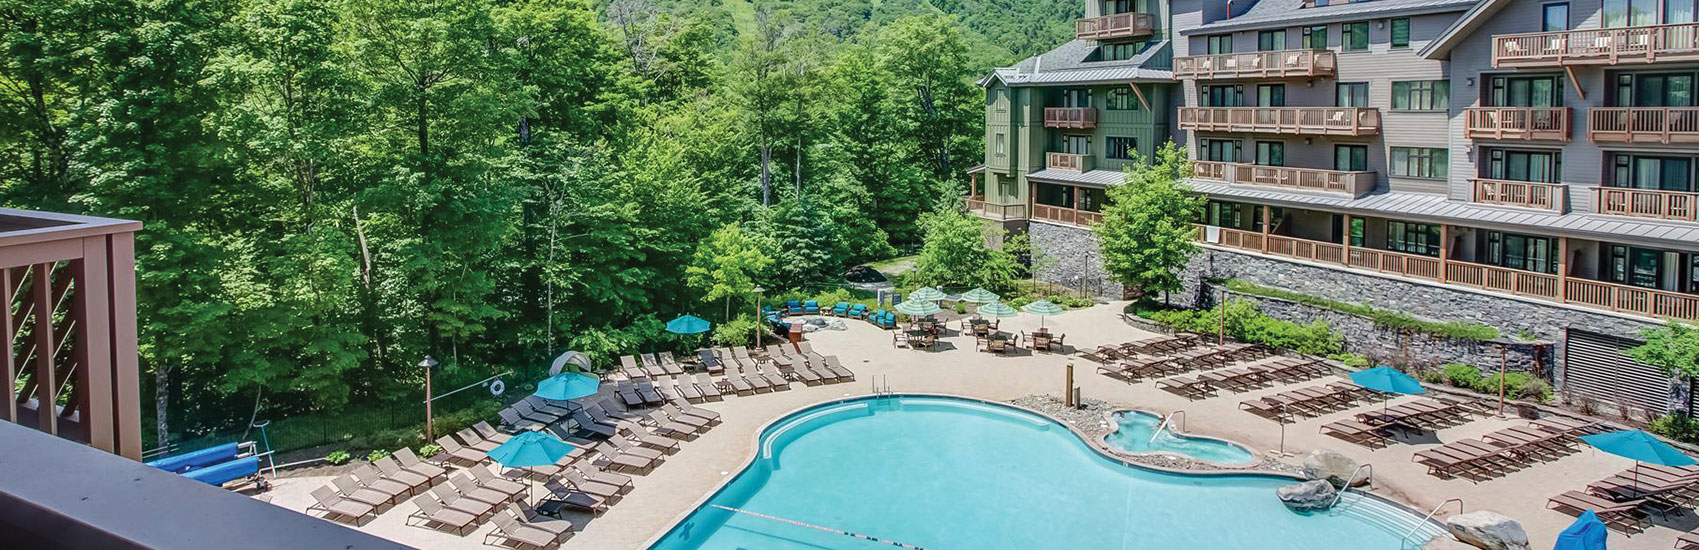 The Lodge at Spruce Peak 1